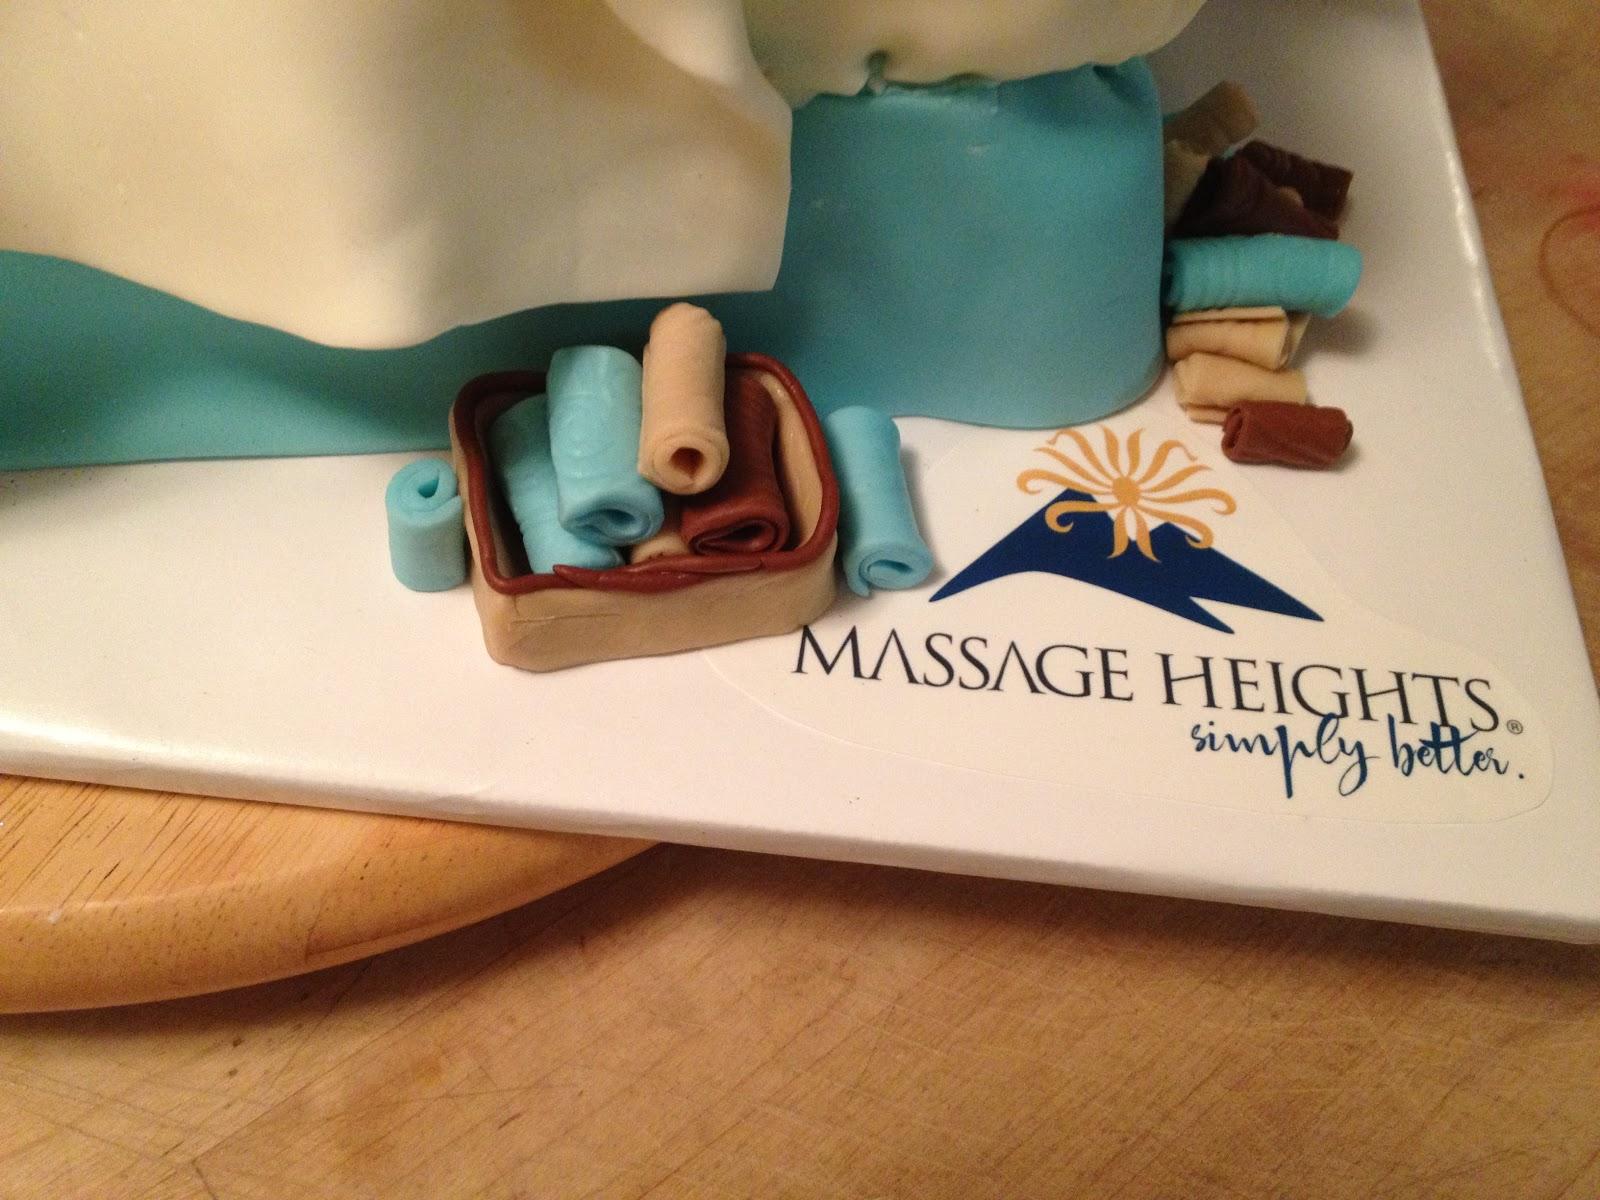 Cakecreated Massage Heights Massage Table Cake